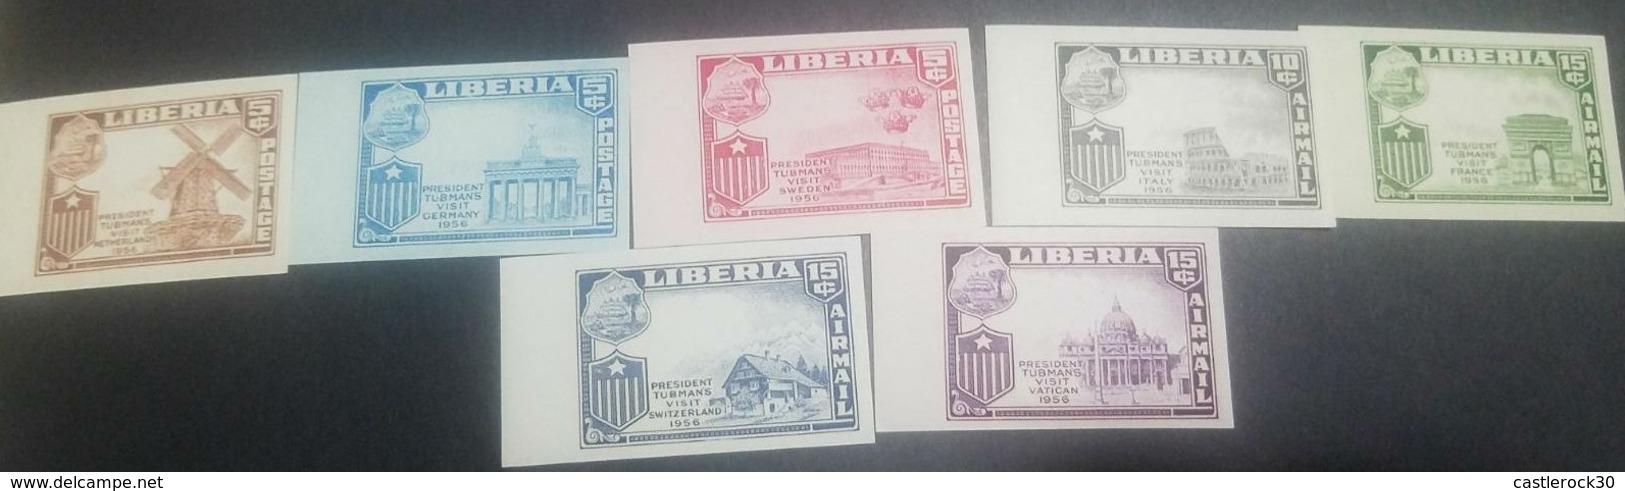 O) 1958 LIBERIA, PROOF -ERROR OF PRINT, WINDMILL AND DUTCH FLAG, GERMAN FLAG AND BRANDENBURG GATE-PRESIDENT WILLIAM VACA - Liberia